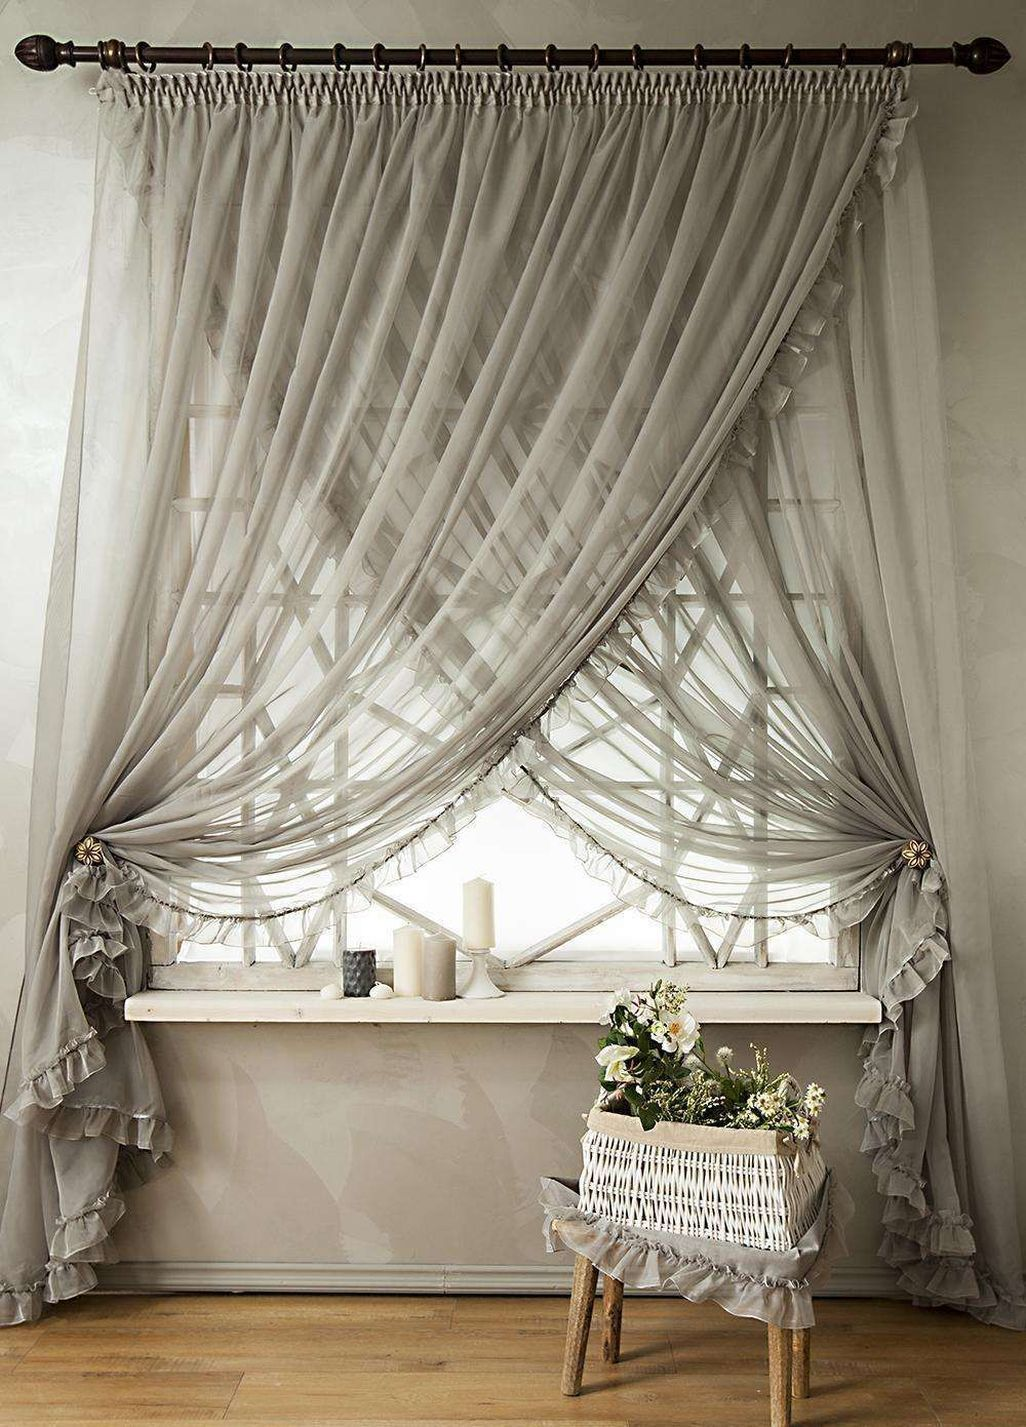 Nice 43 Ispiring Home Curtain Design Ideas More At Https Trend4homy Com 2018 08 13 43 Ispiring Home C Jalousien Schlafzimmerfenster Vorhange Vorhange Modern